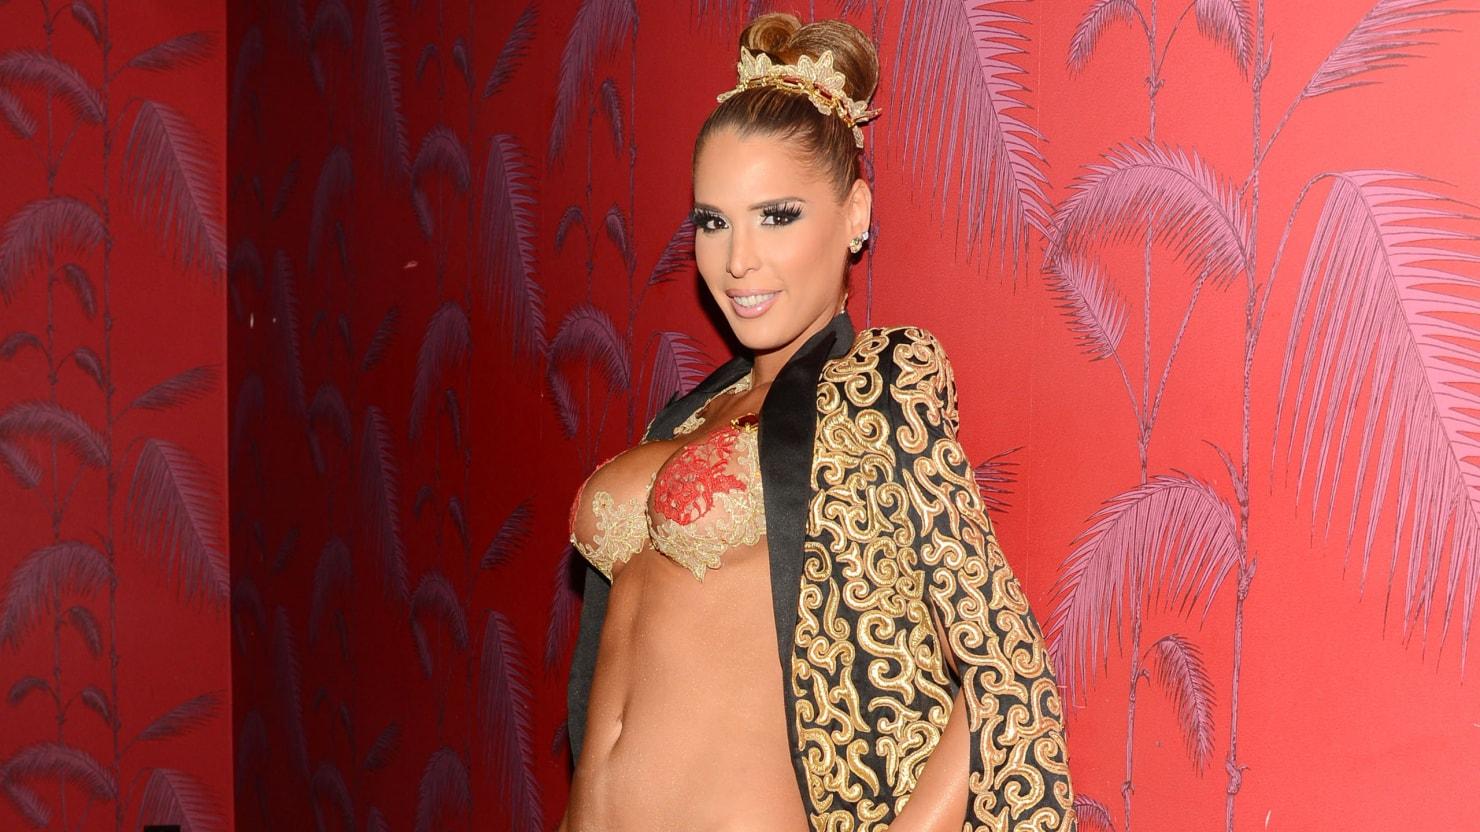 Transgender Model Carmen Carrera Says She Wants To Walk The Victoria's  Secret Show